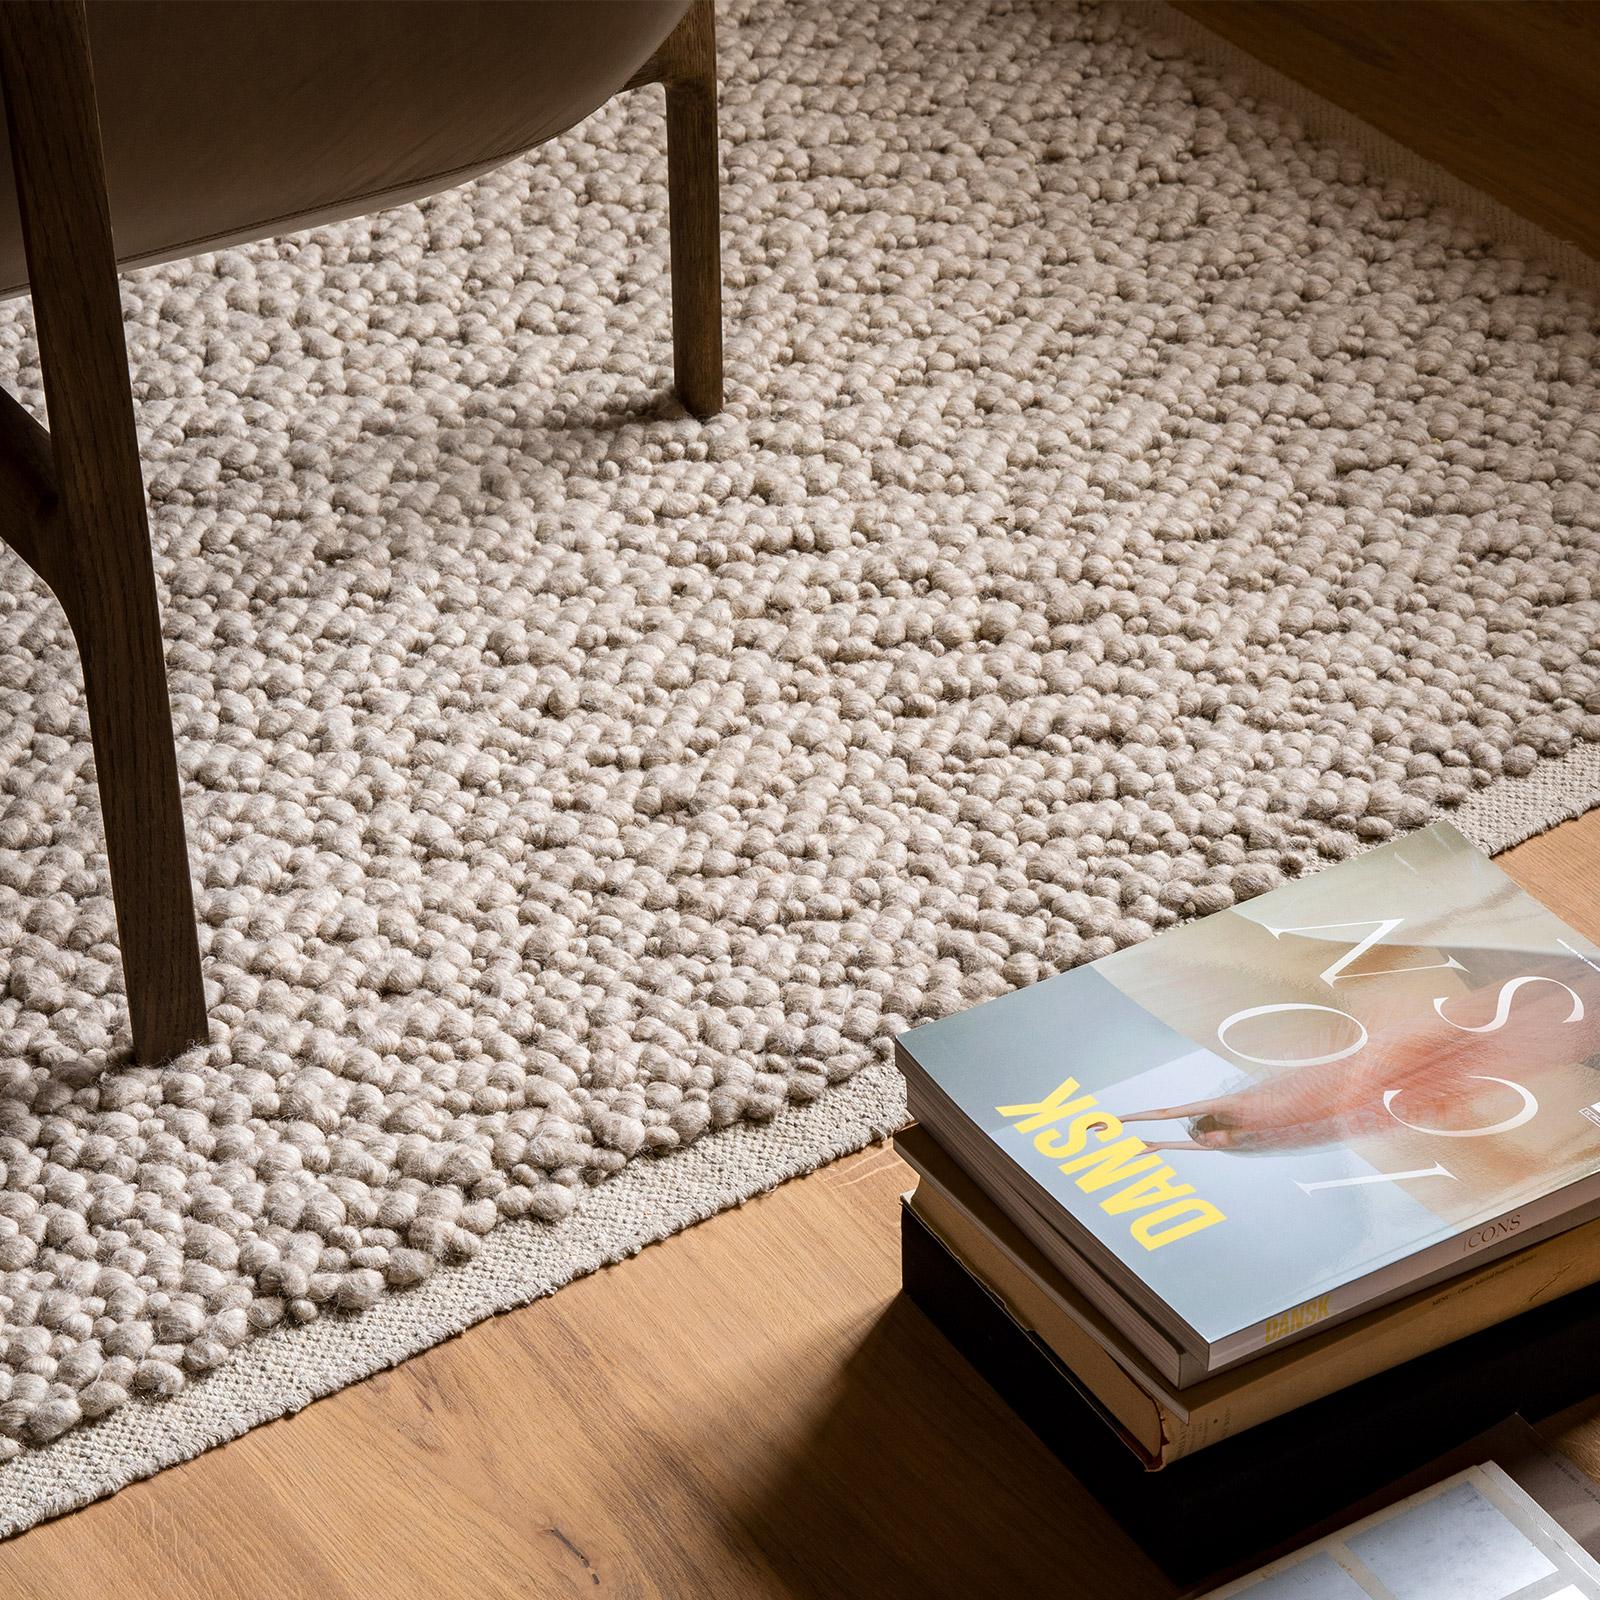 textured cream wool rug on wooden floor with art magazines